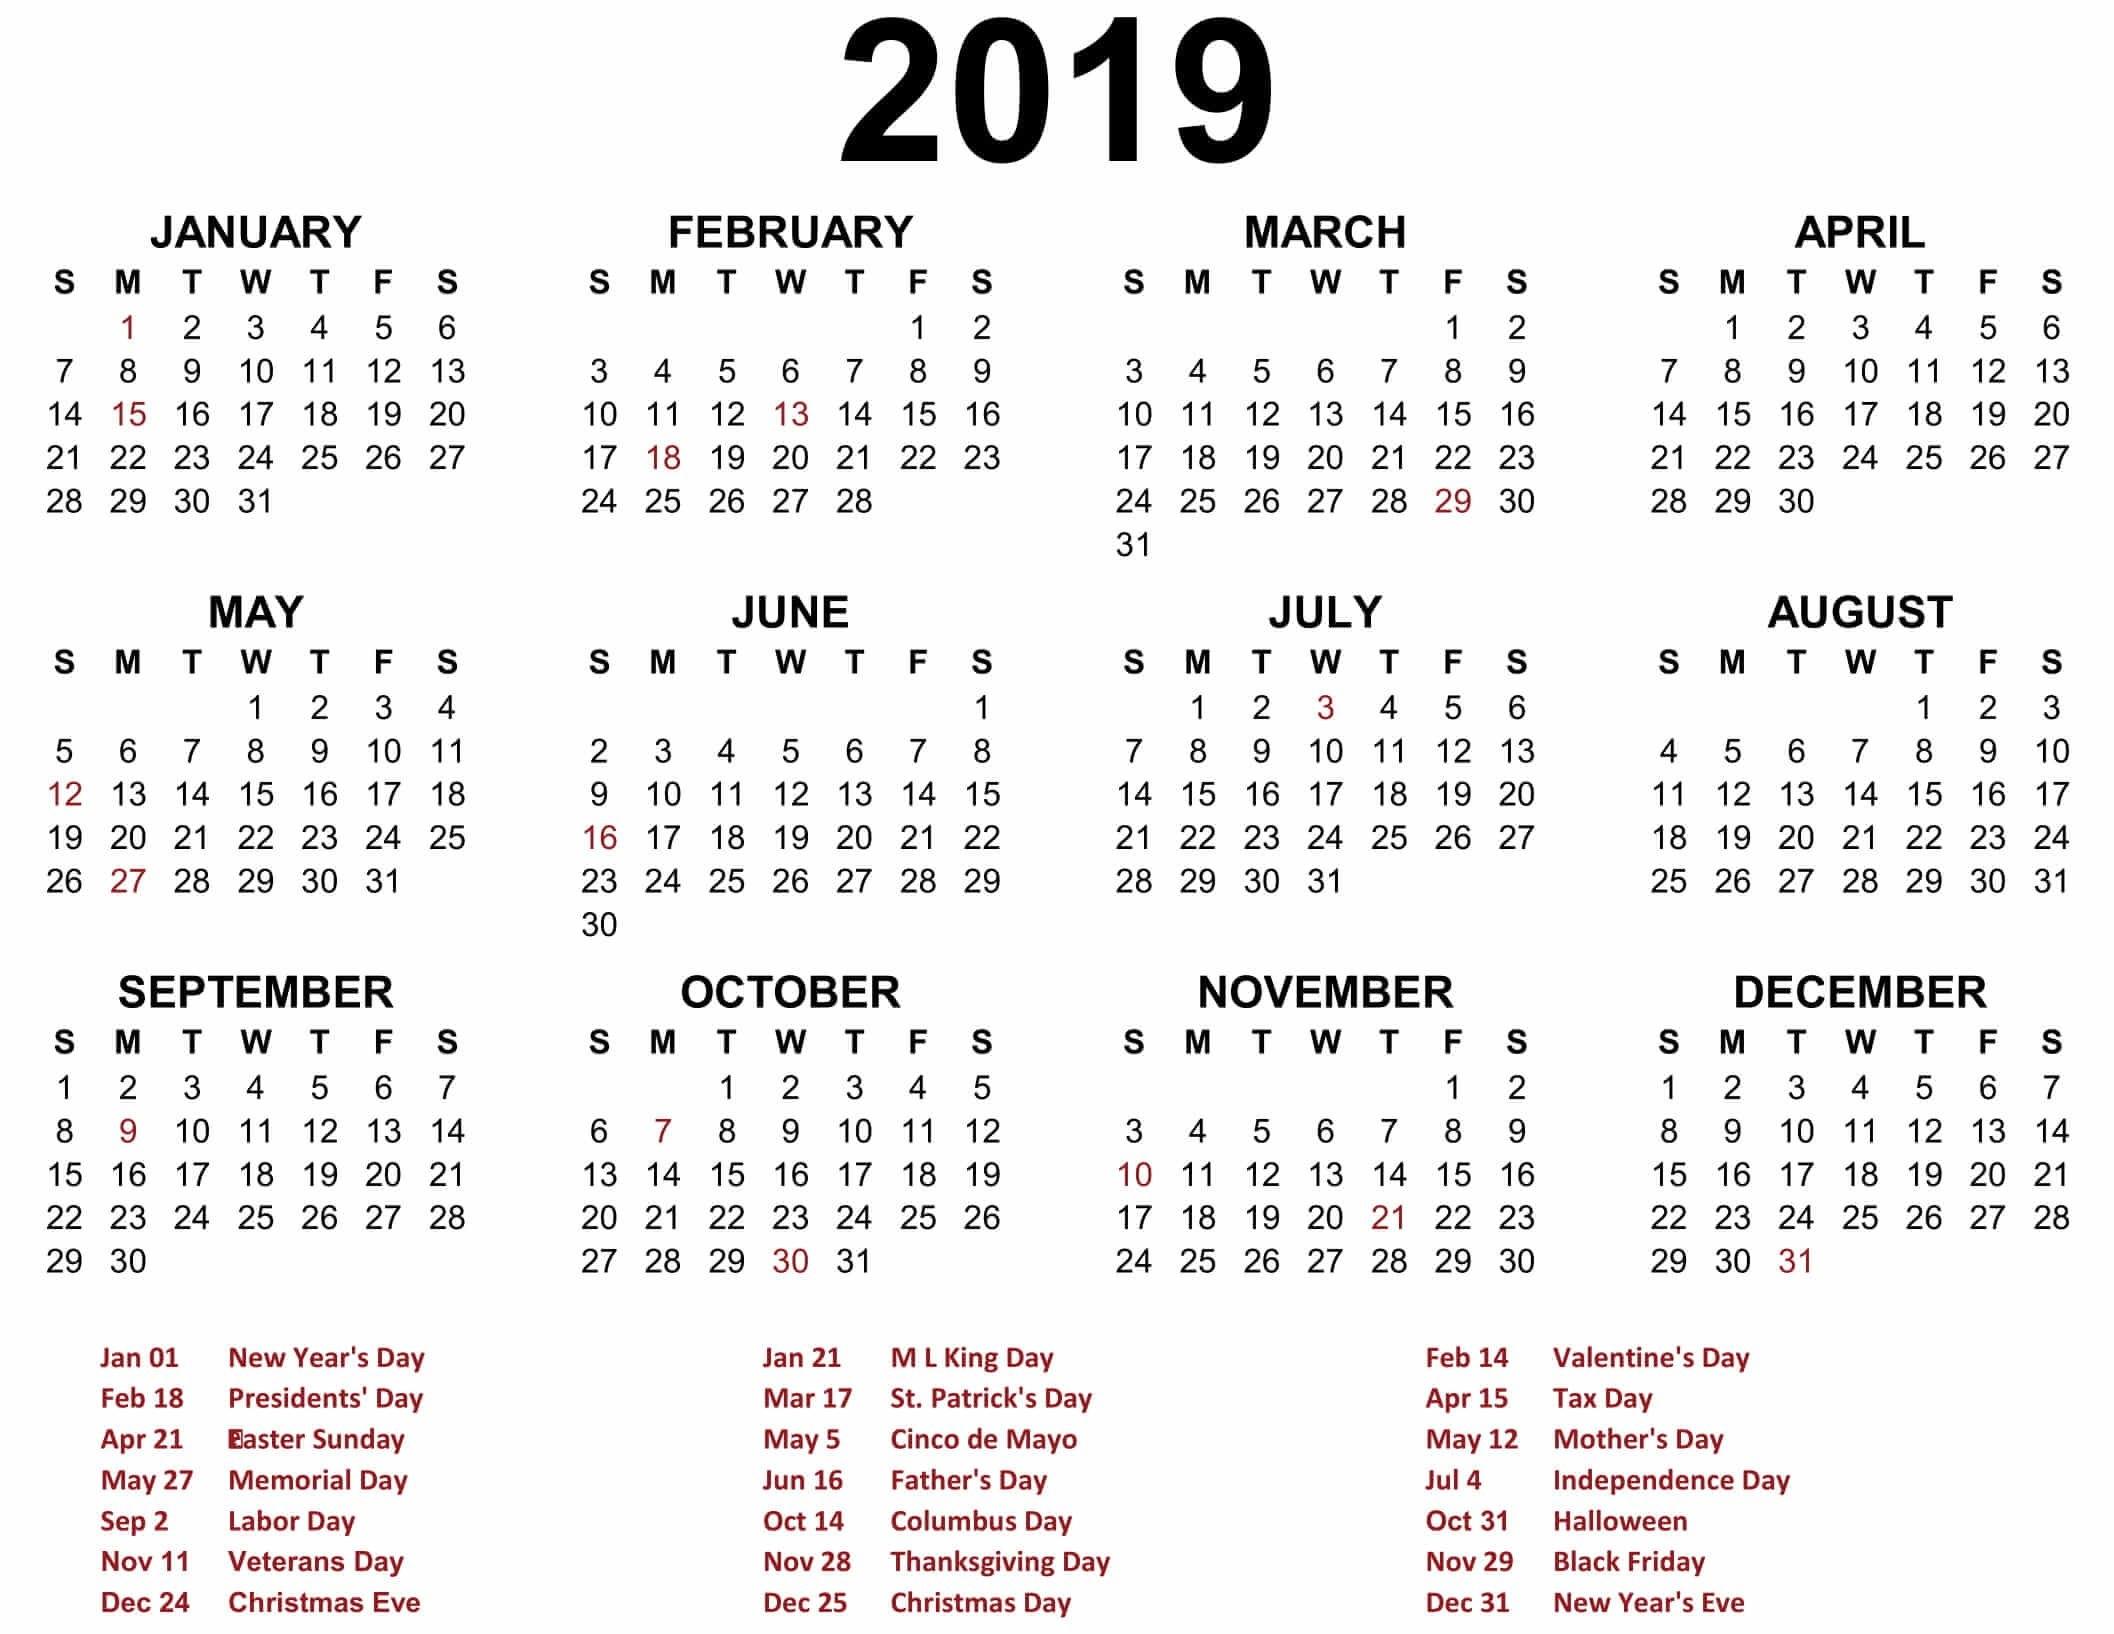 Printable Blank 2019 Calendar Templates - Calenndar Calendar Of 2019